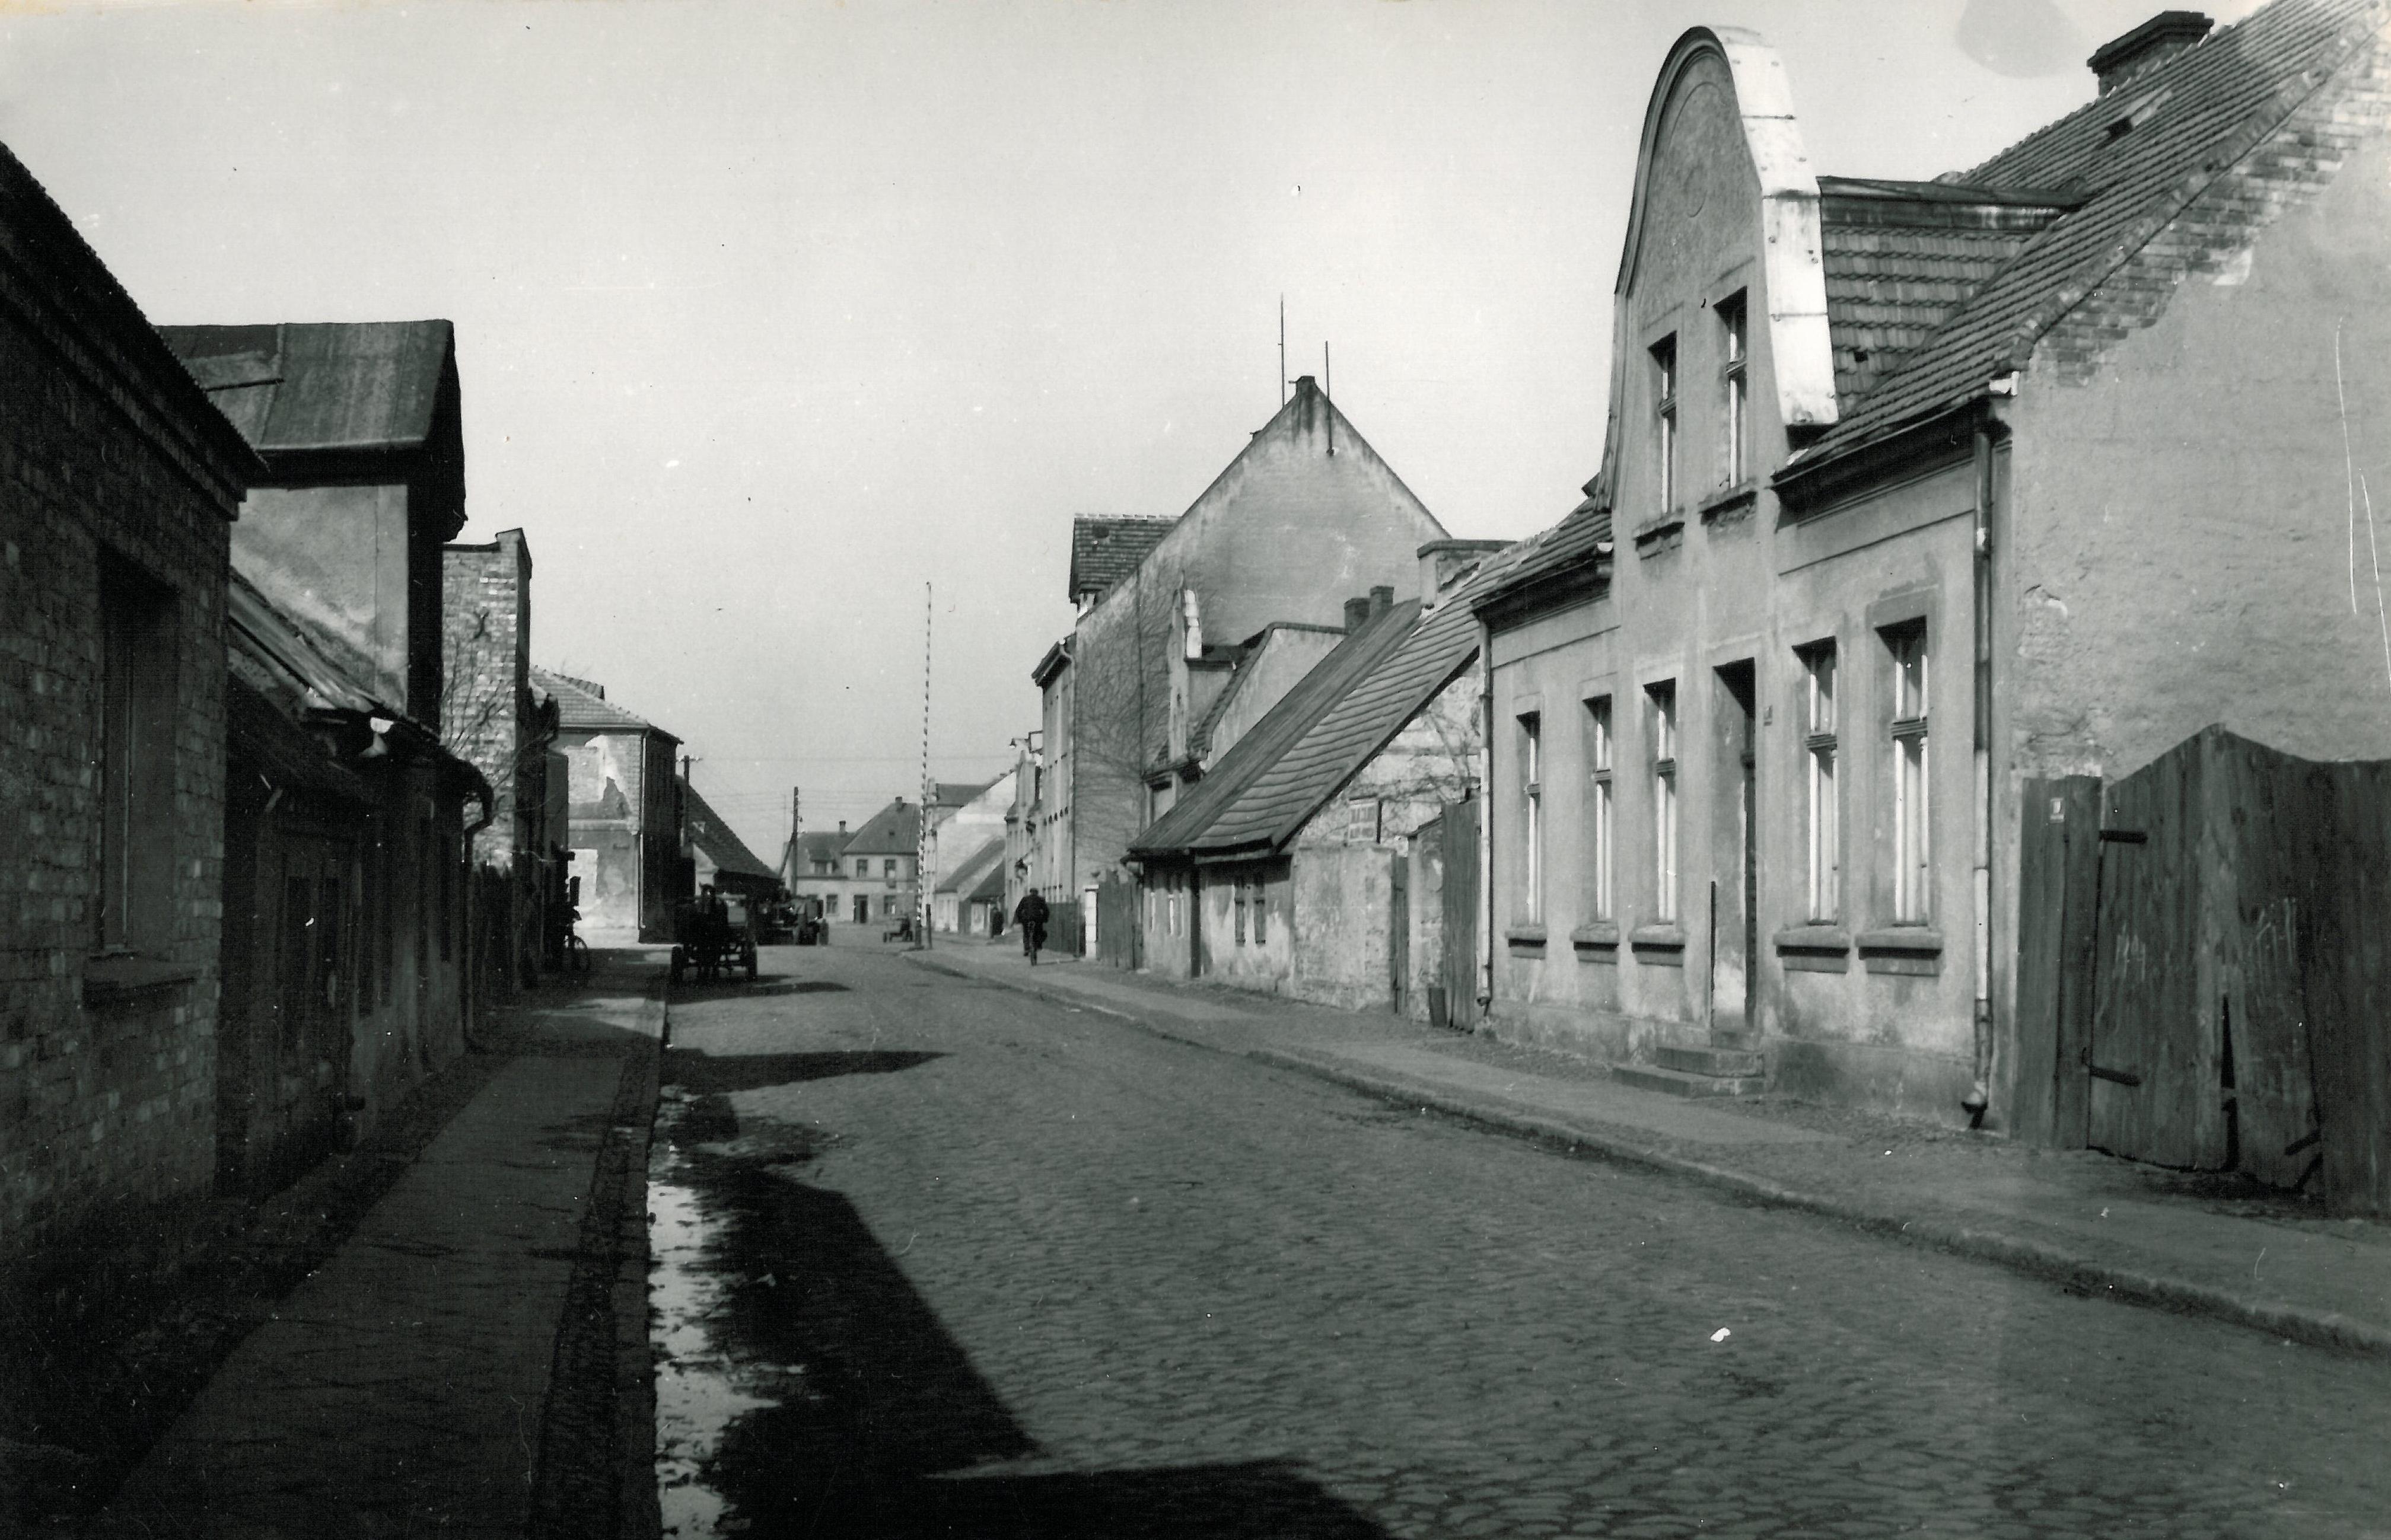 ulica wojska polskiego kórnik